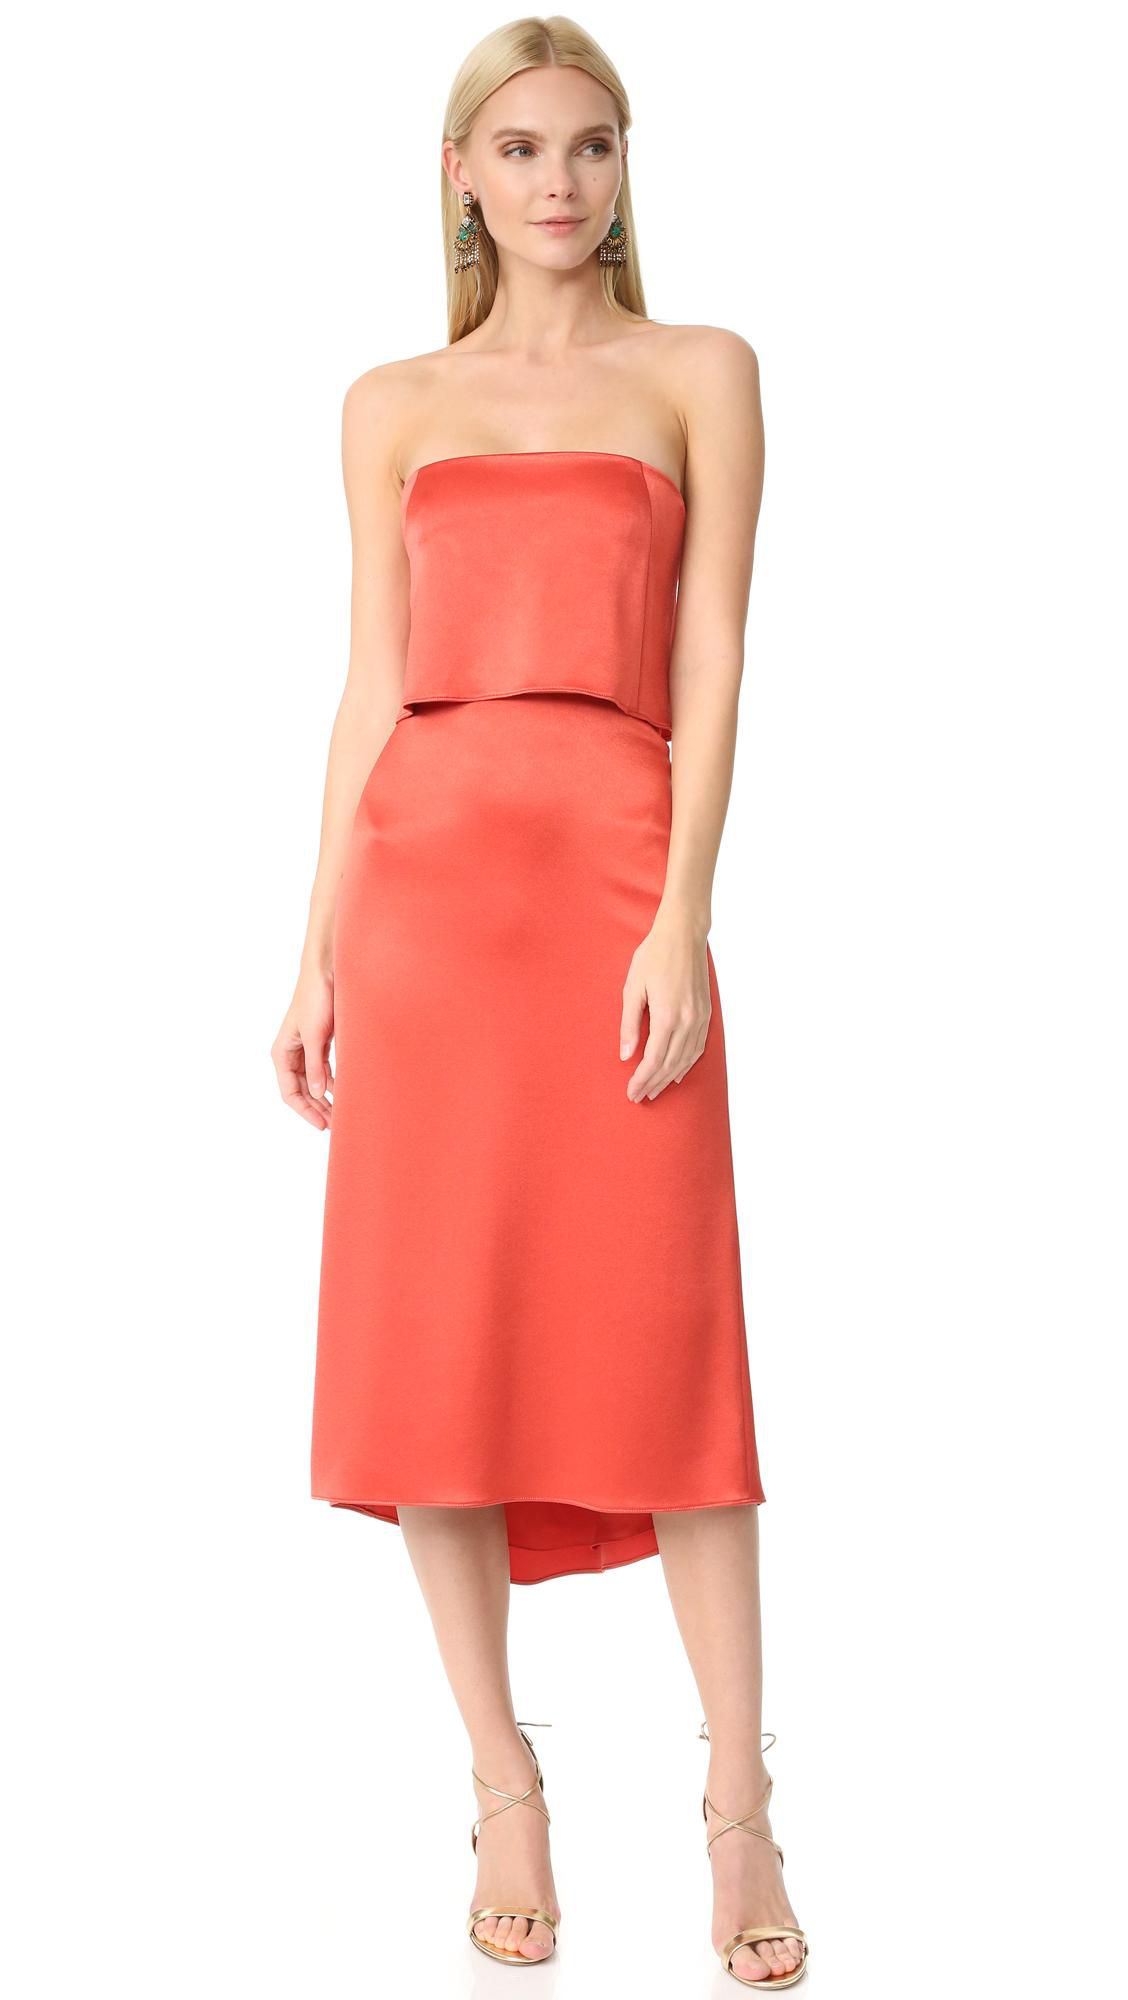 A strapless orange satin dress